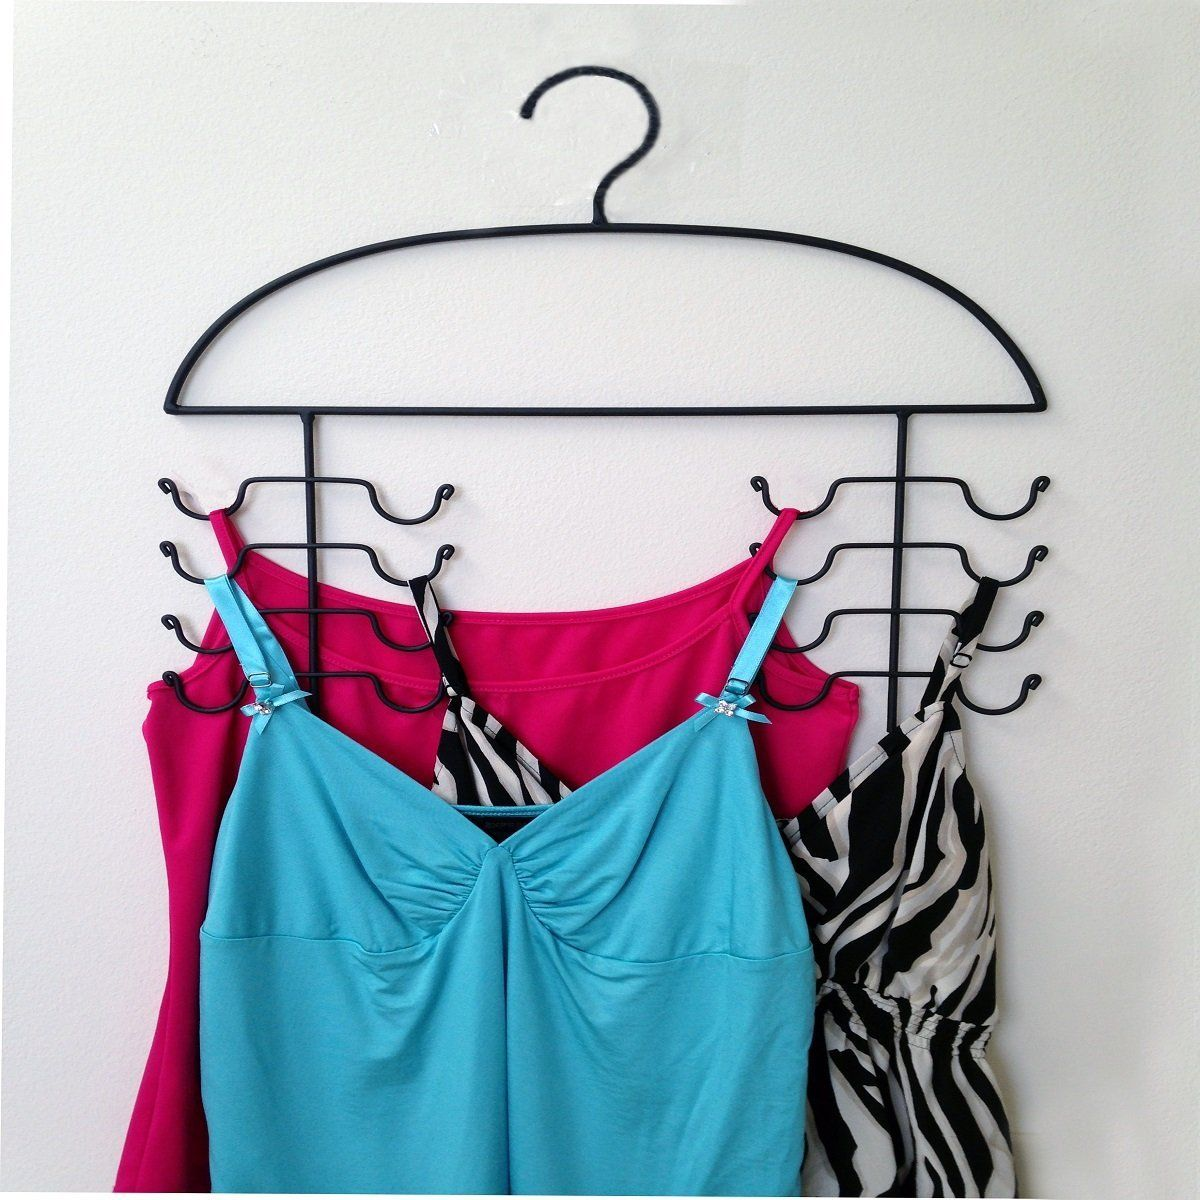 2 TANK TOP HANGERS SPORT CAMI BRA STRAPPY DRESS BATHING SUIT CLOSET ORGANIZER